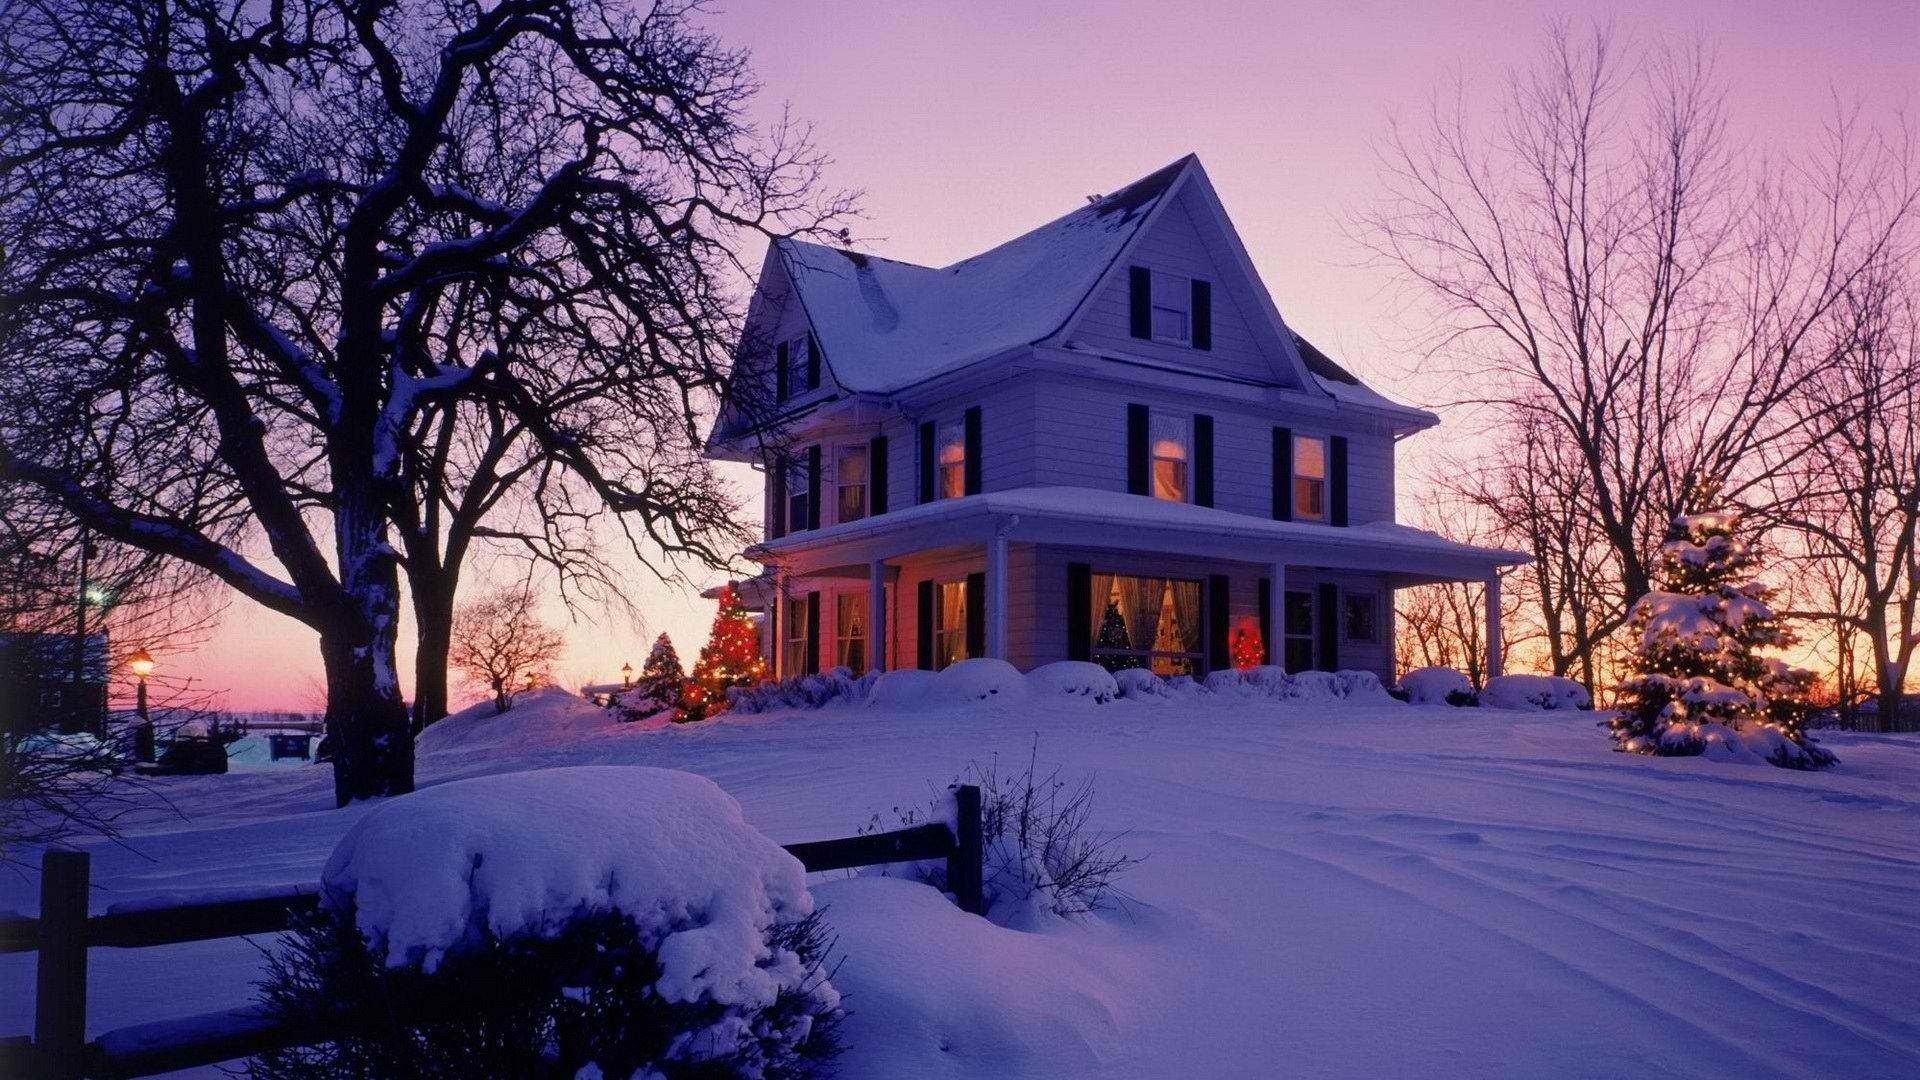 Winter Aesthetic Wallpaper Free